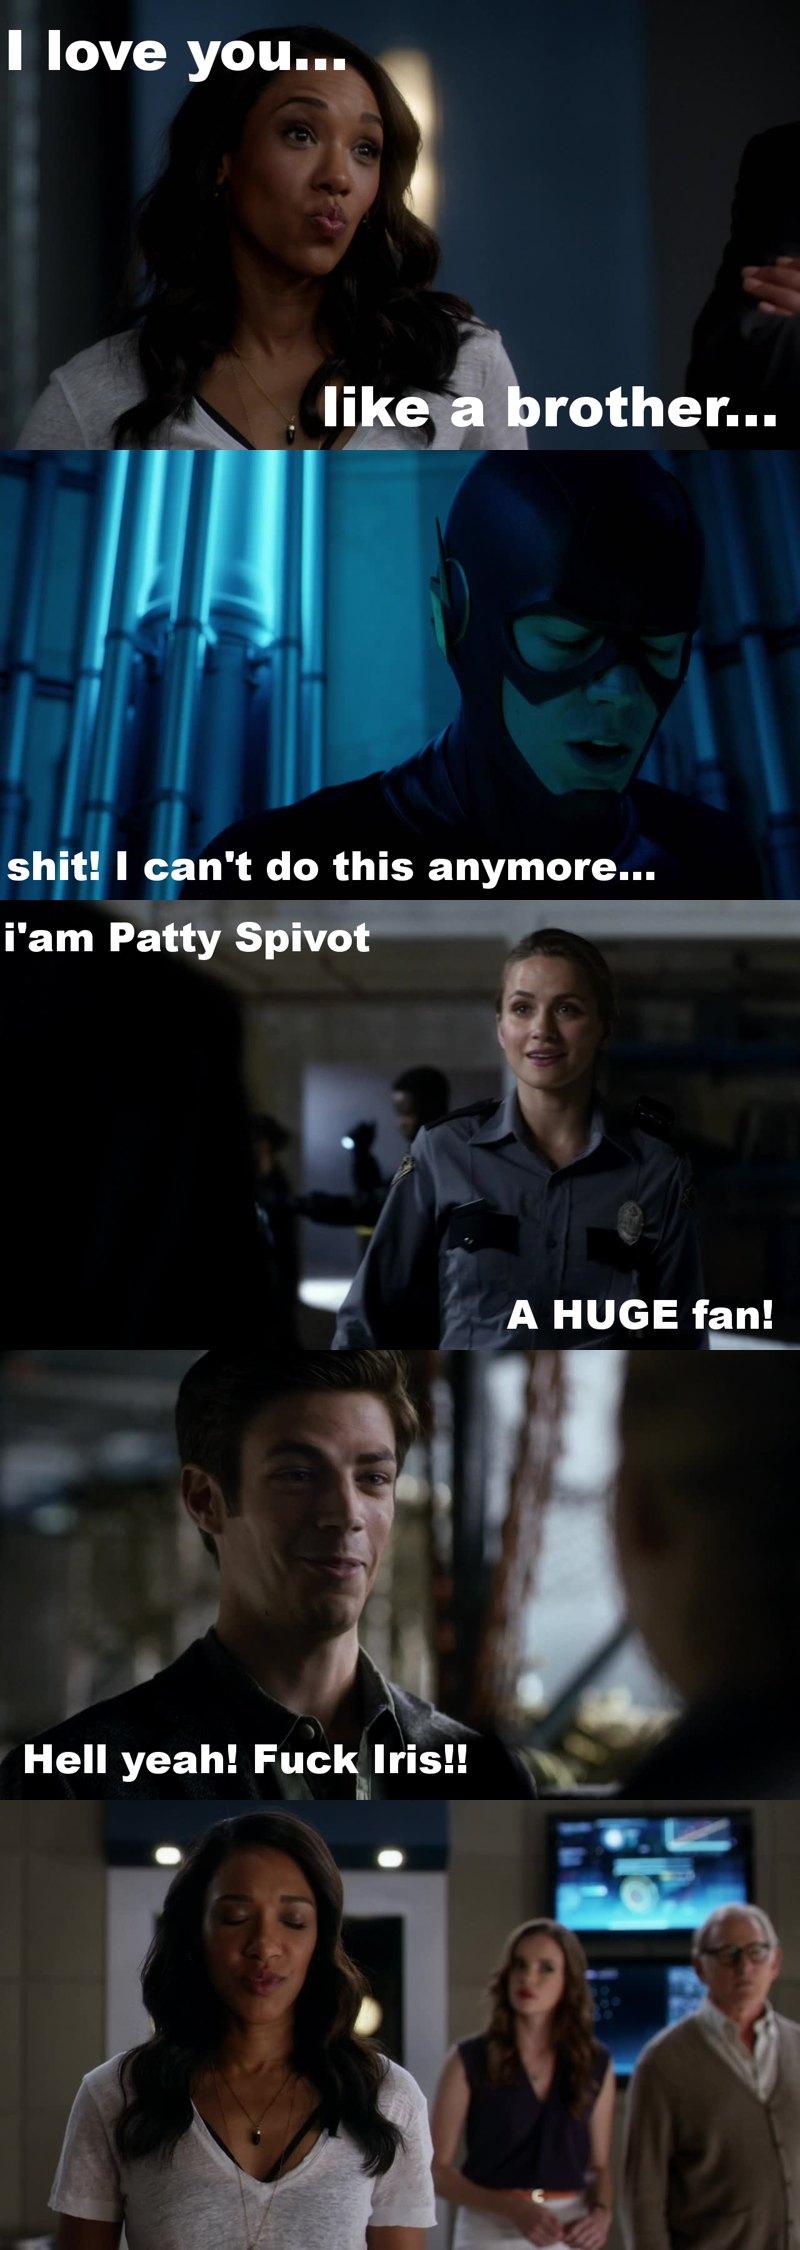 Hahaha run Barry, run!